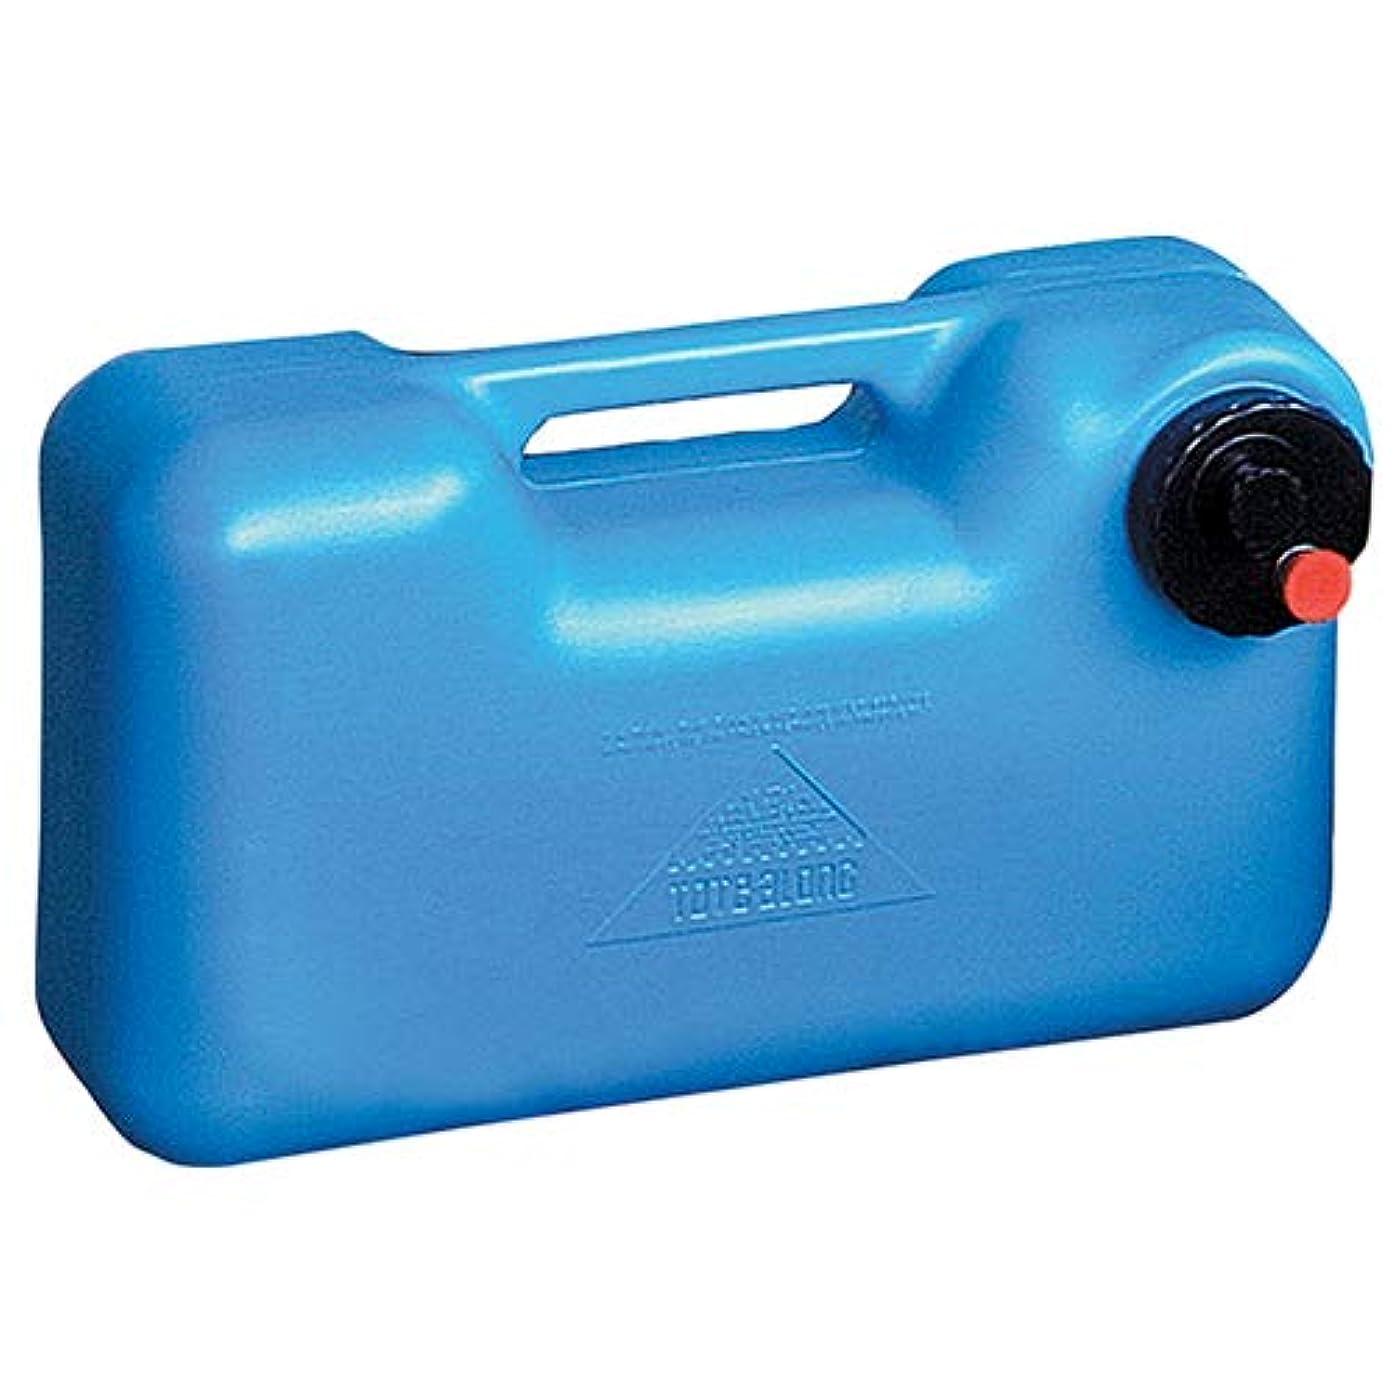 Barker Manufacturing Company 10887 Barker 5 Gallon Tote-Along Drain Water Tank